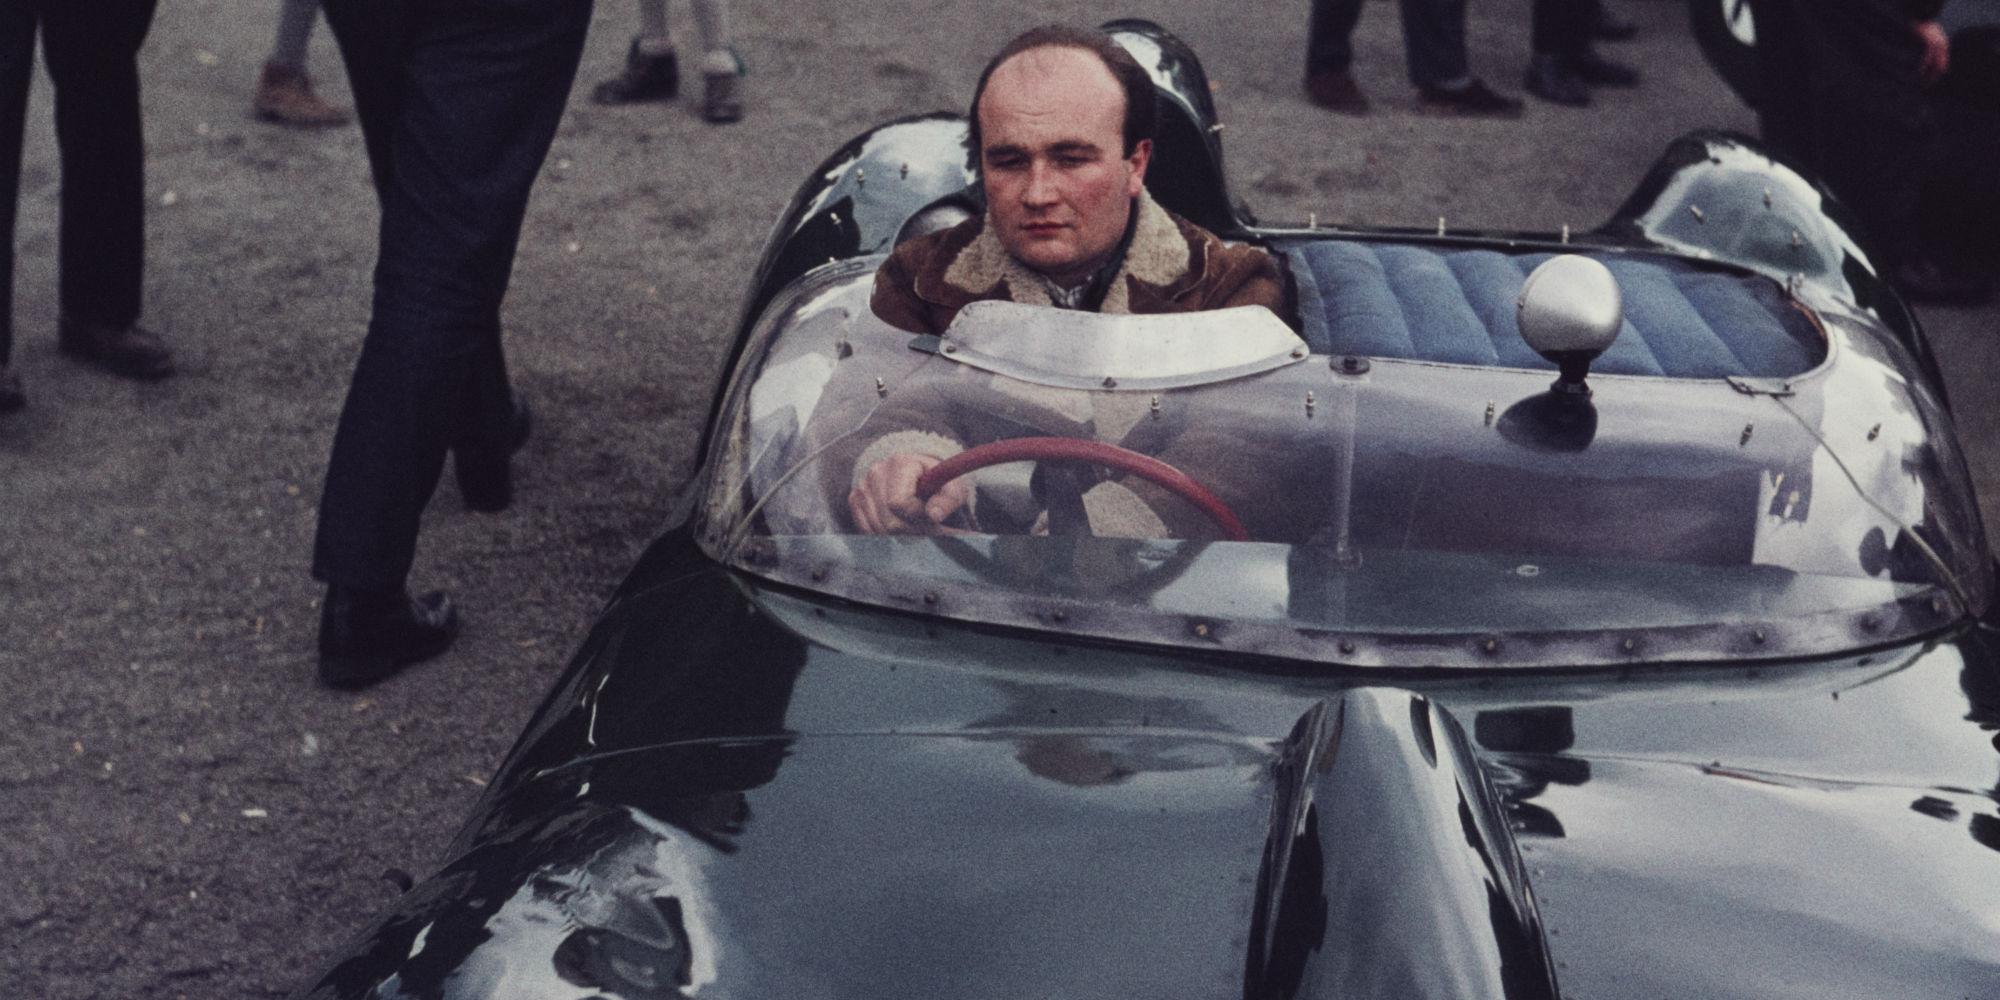 The Ex – Works, Graham Hill, David Piper 1958 Lotus 15